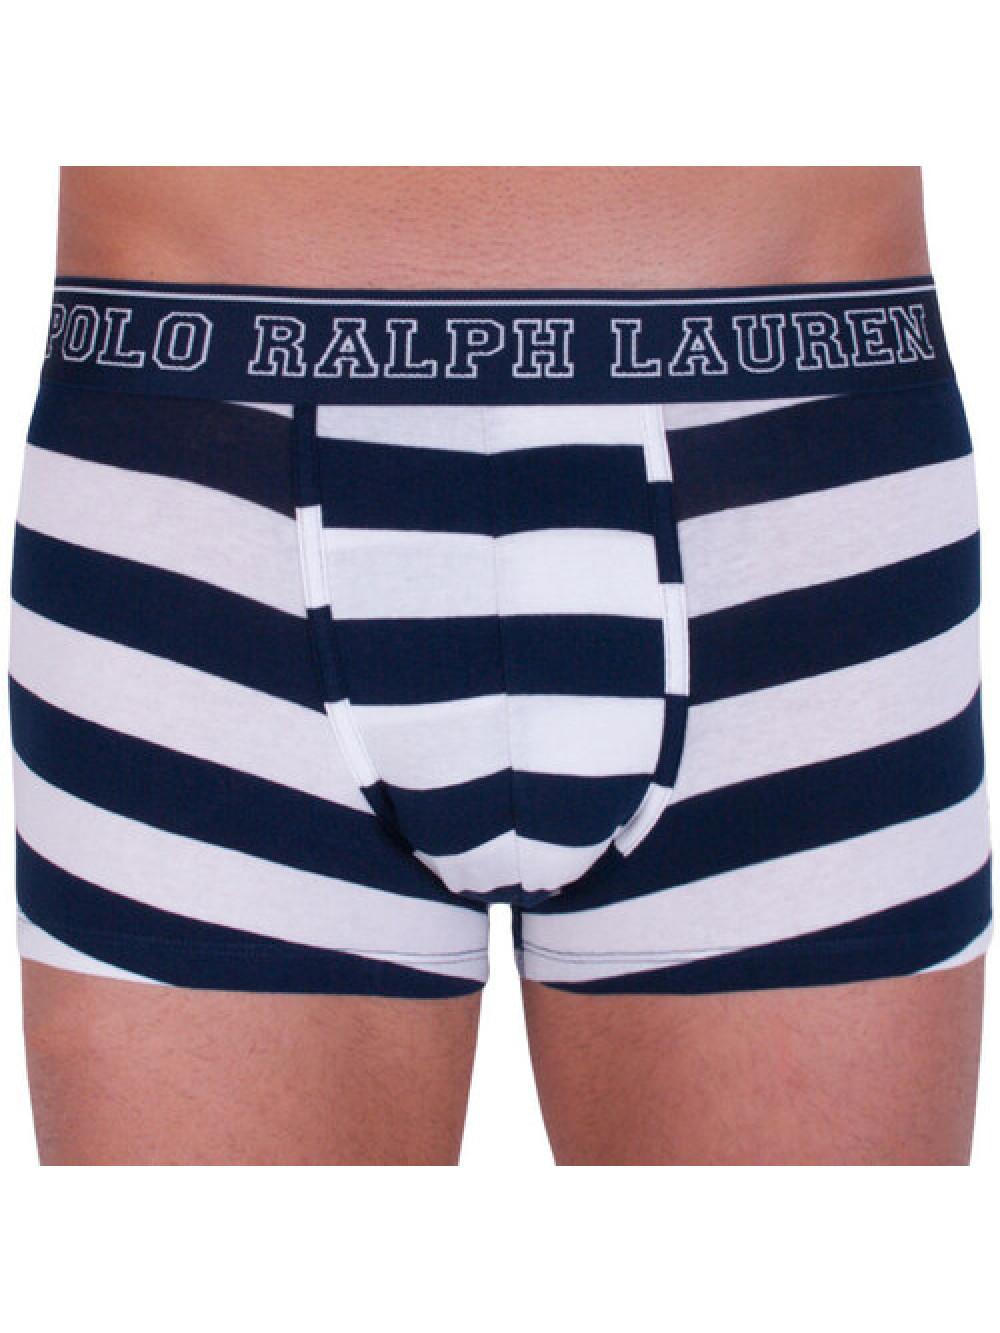 Férfi boxeralsó Polo Ralph Lauren Rugby Stripe fehér-kék